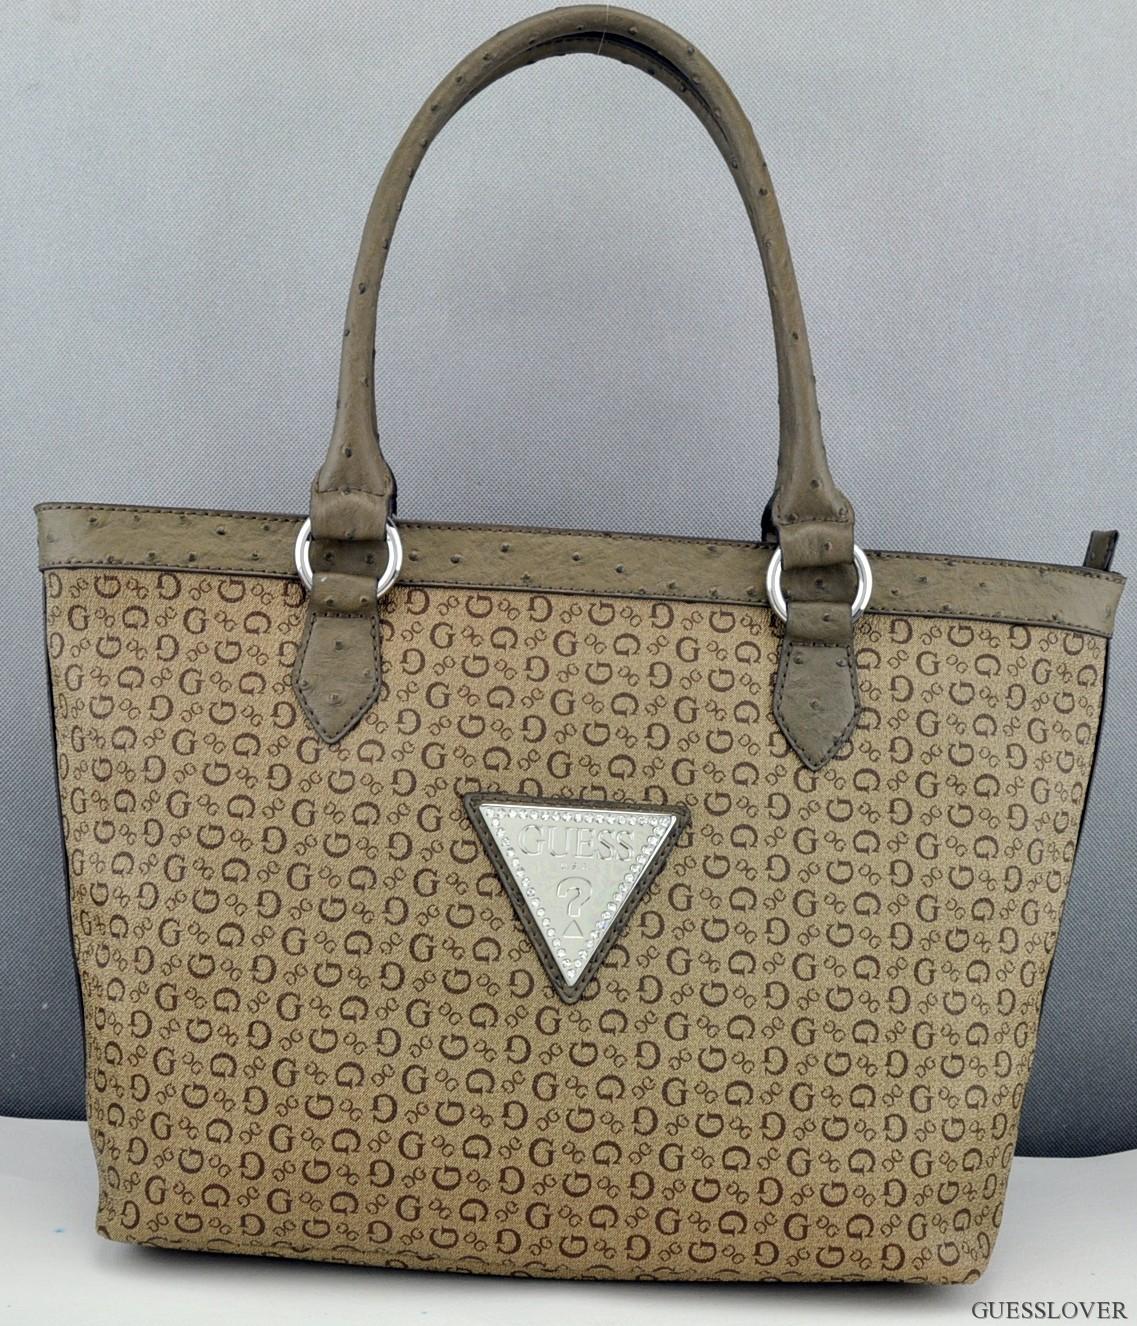 Details about FREE Ship USA! Handbag GUESS Totes Tansy Ladies Mocha Bag Prime